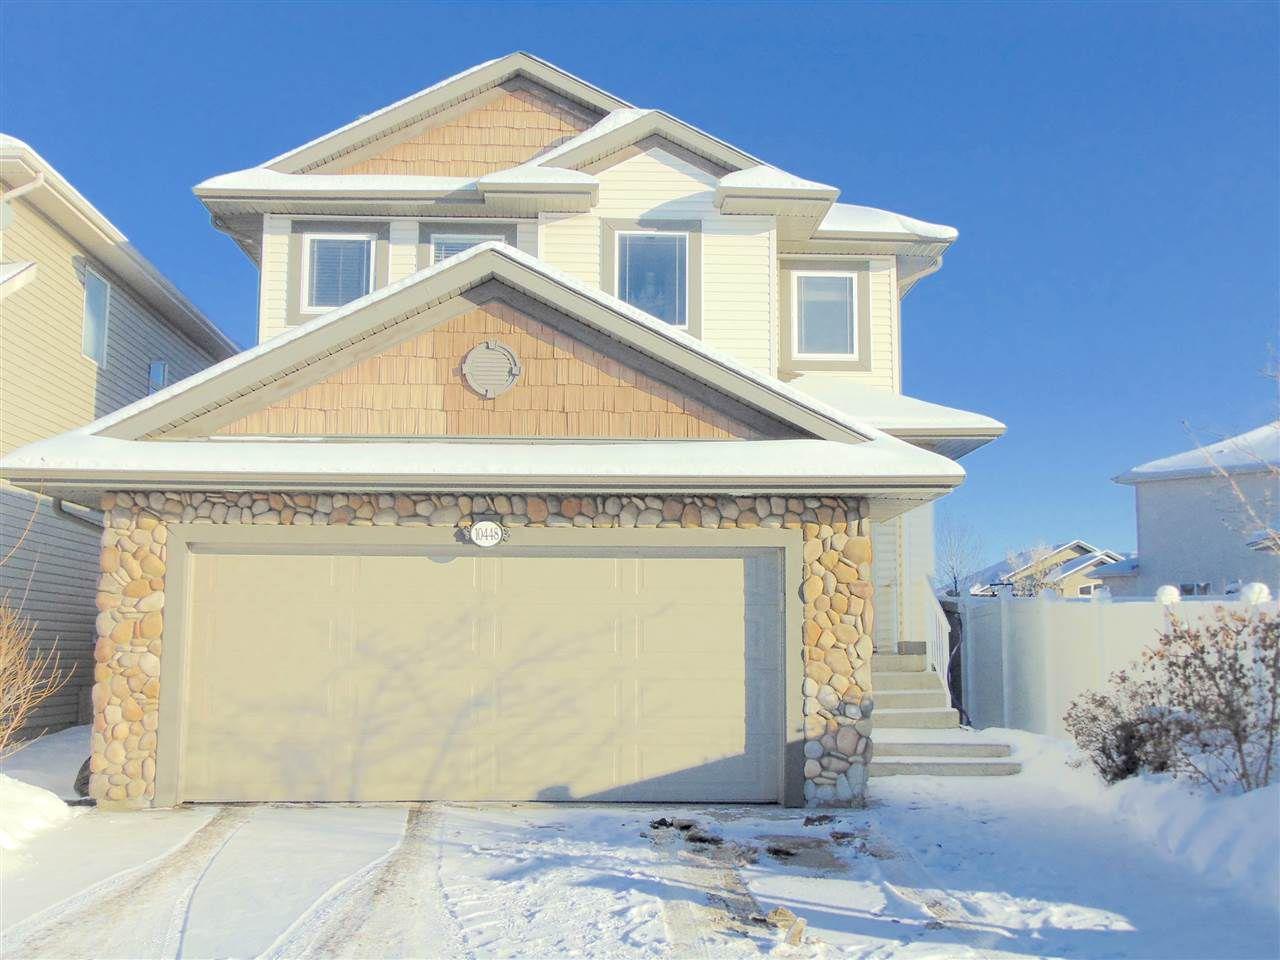 Main Photo: 10448 182A Avenue in Edmonton: Zone 27 House for sale : MLS®# E4138728